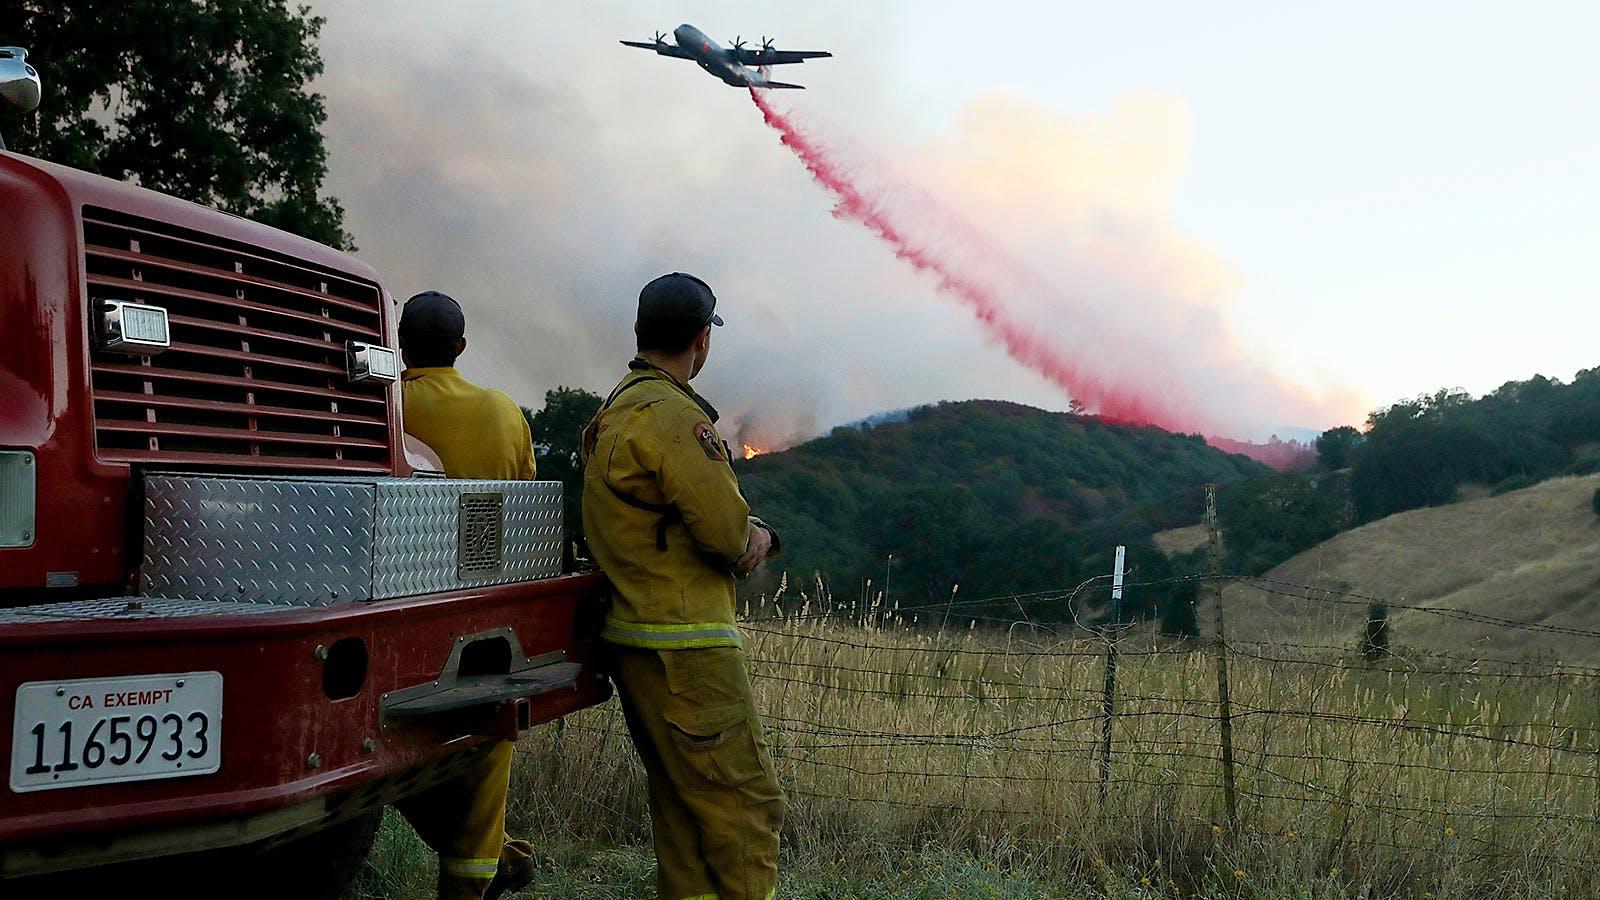 California Wine Country Bracing for Fire Season